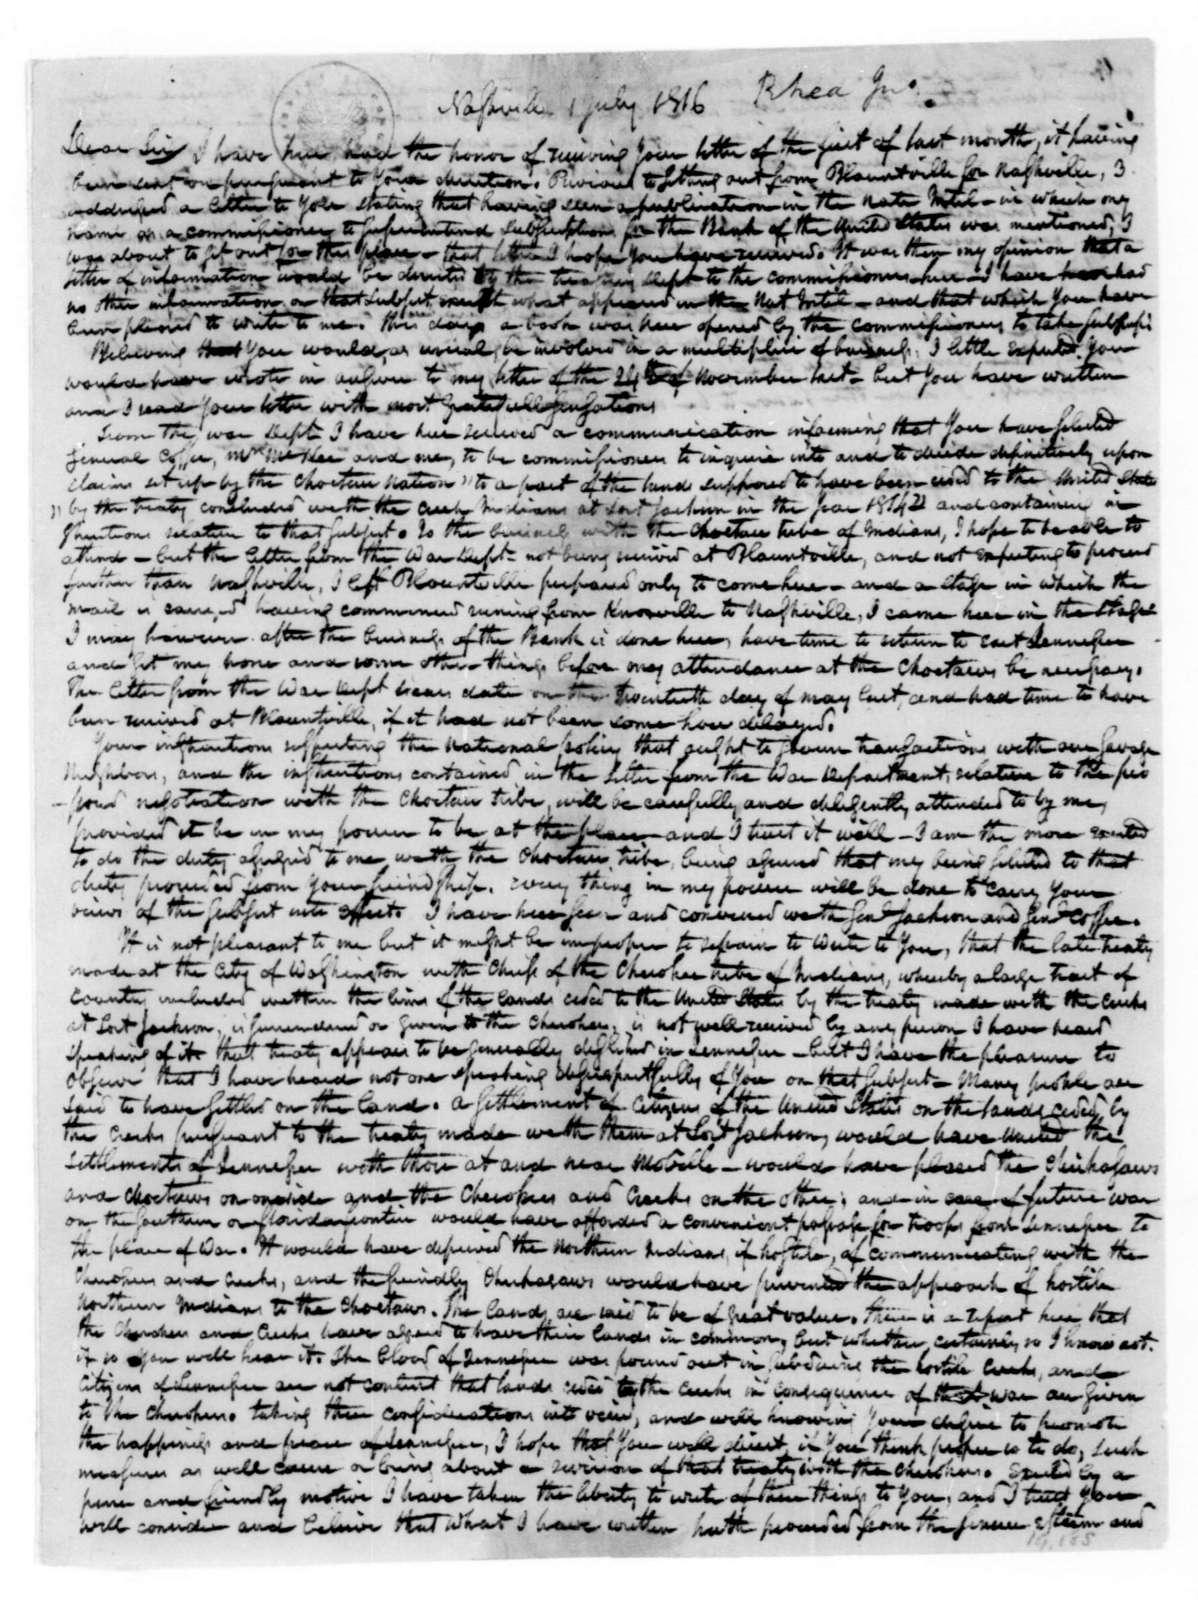 John Rhea to James Madison, July 1, 1816.